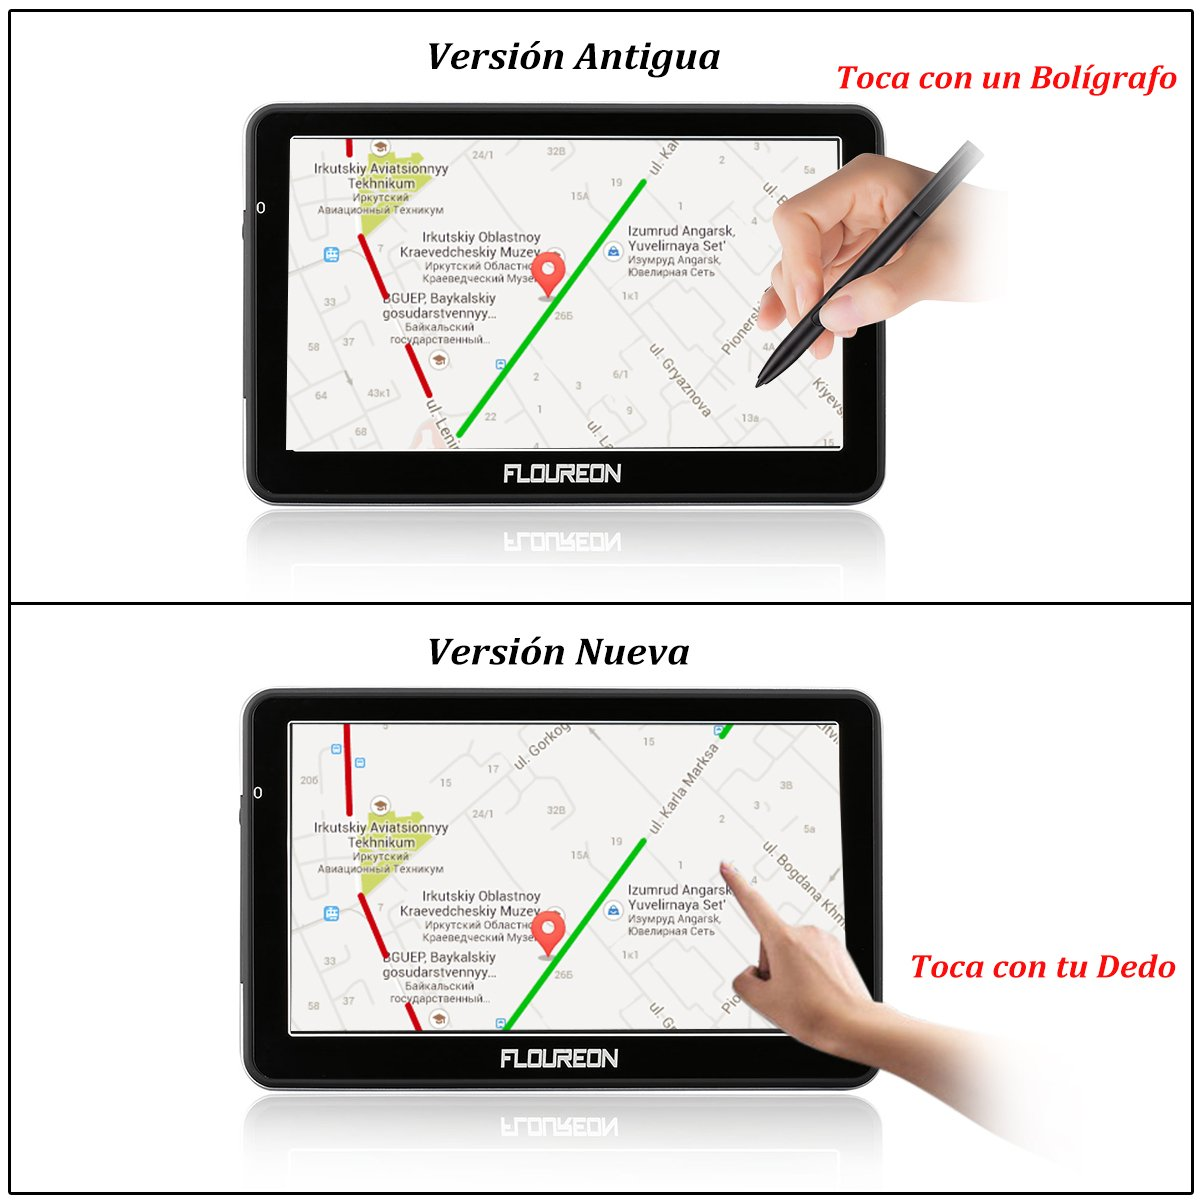 FLOUREON Pantalla táctil LCD capacitiva de 7 Pulgadas de navegación GPS de Coches Navegador de camión y Coche con actualizaciones de mapas de por Vida- Azul